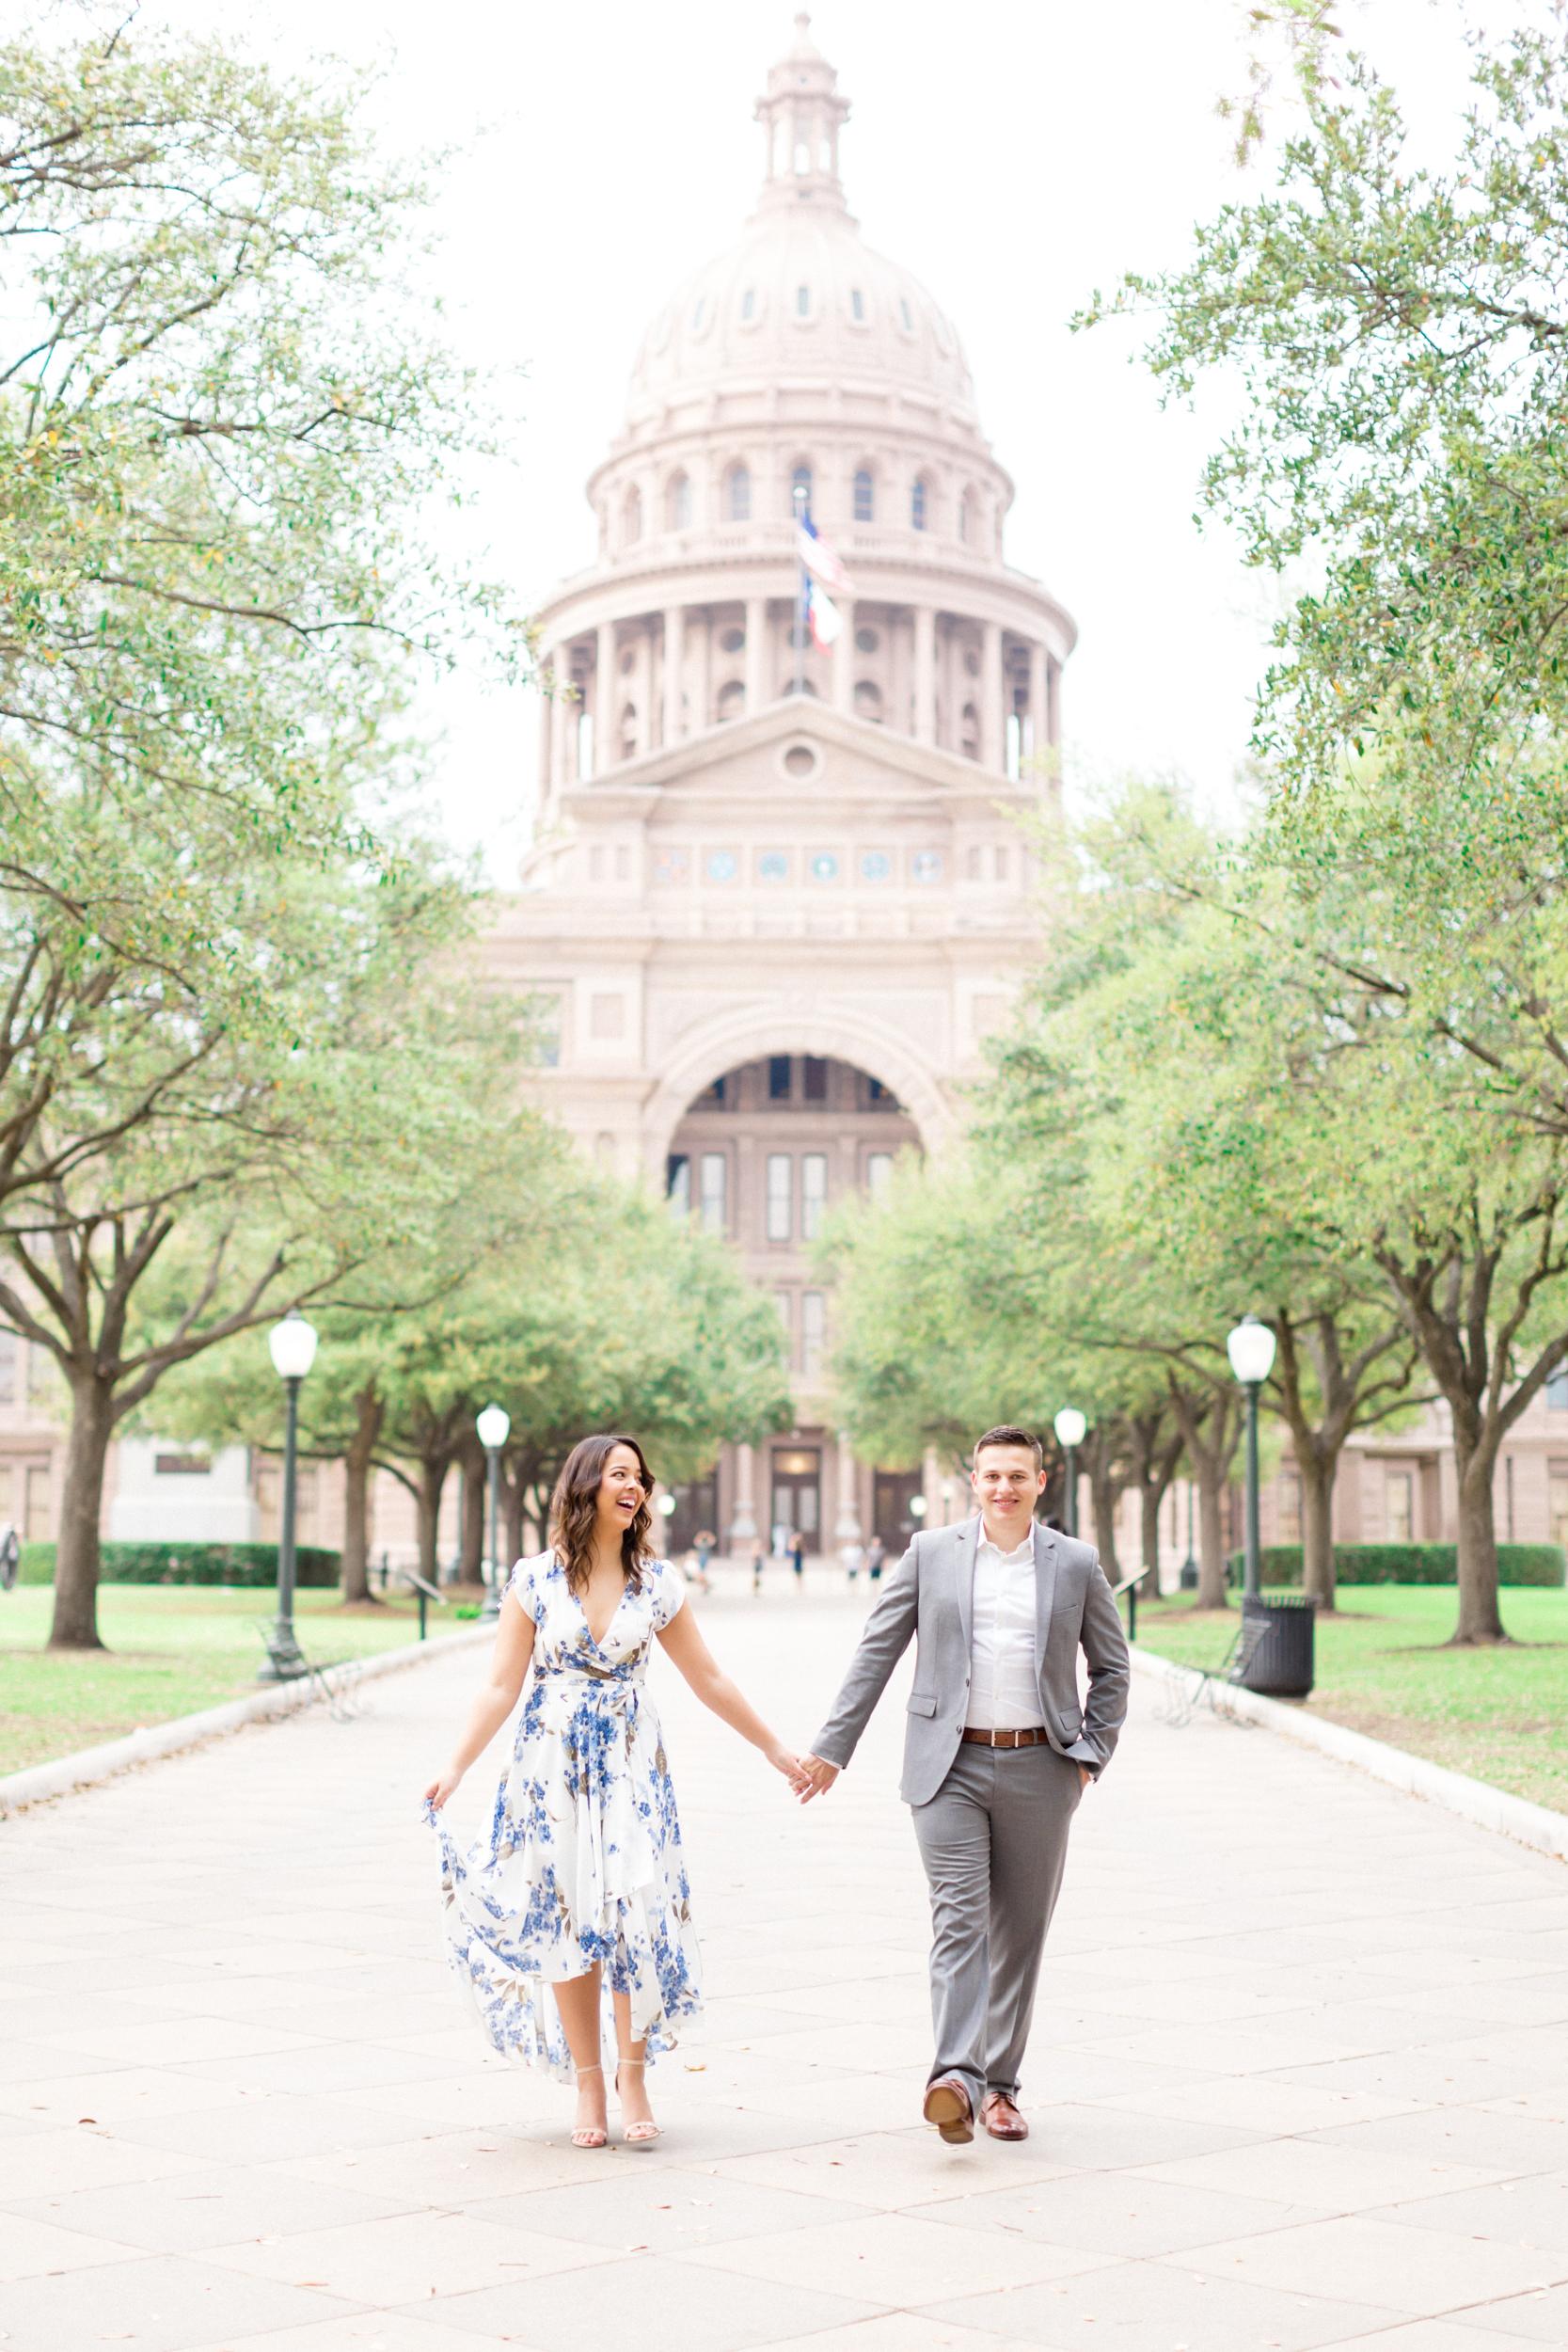 San Antonio Austin Tx Texas Hill Country Wedding Engagement Anniversary Photographer Engagement Anniversary Photo Session Pictures Texas Capitol session UT Campus session Austin skyline session